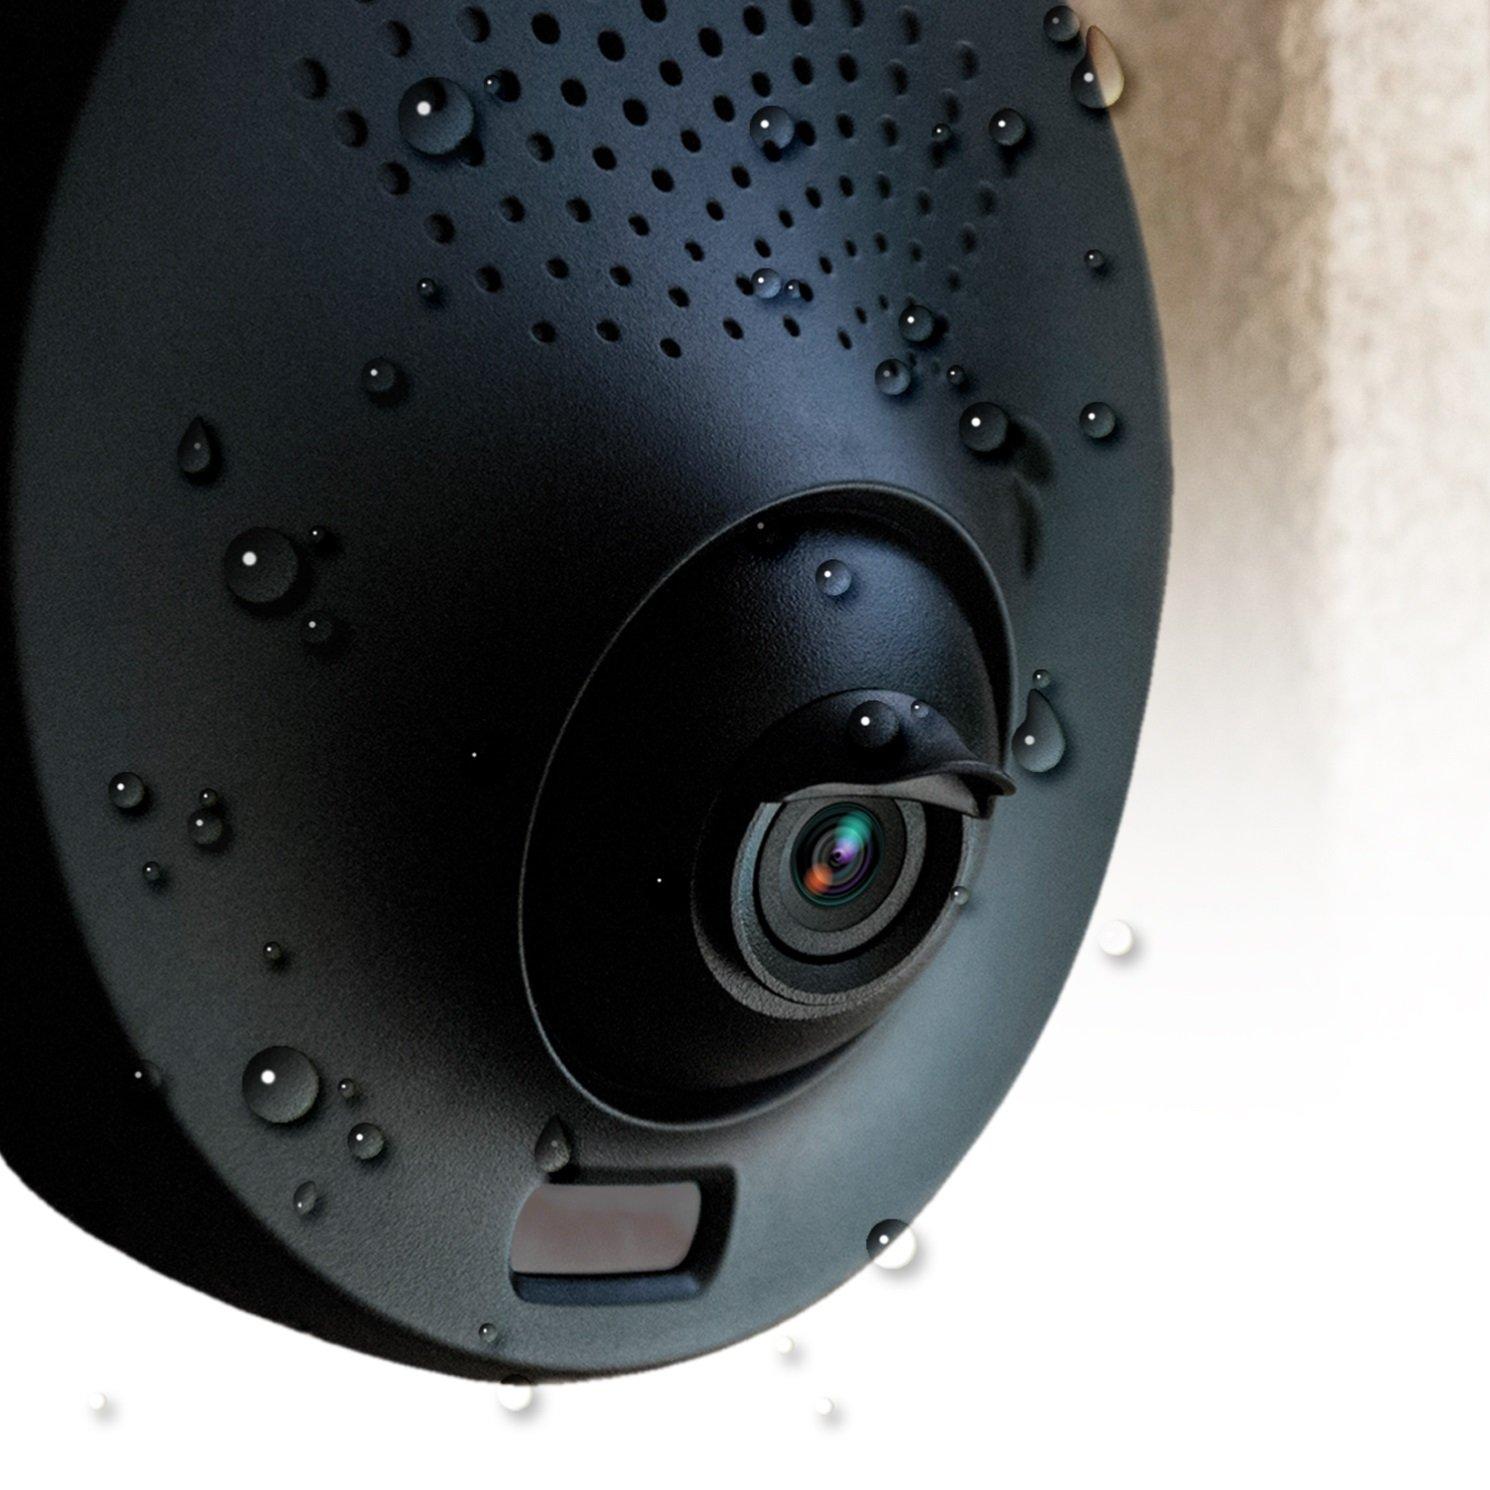 Camera Light Fixture: Weatherproof Outdoor Security Camera, Toucan Powered By